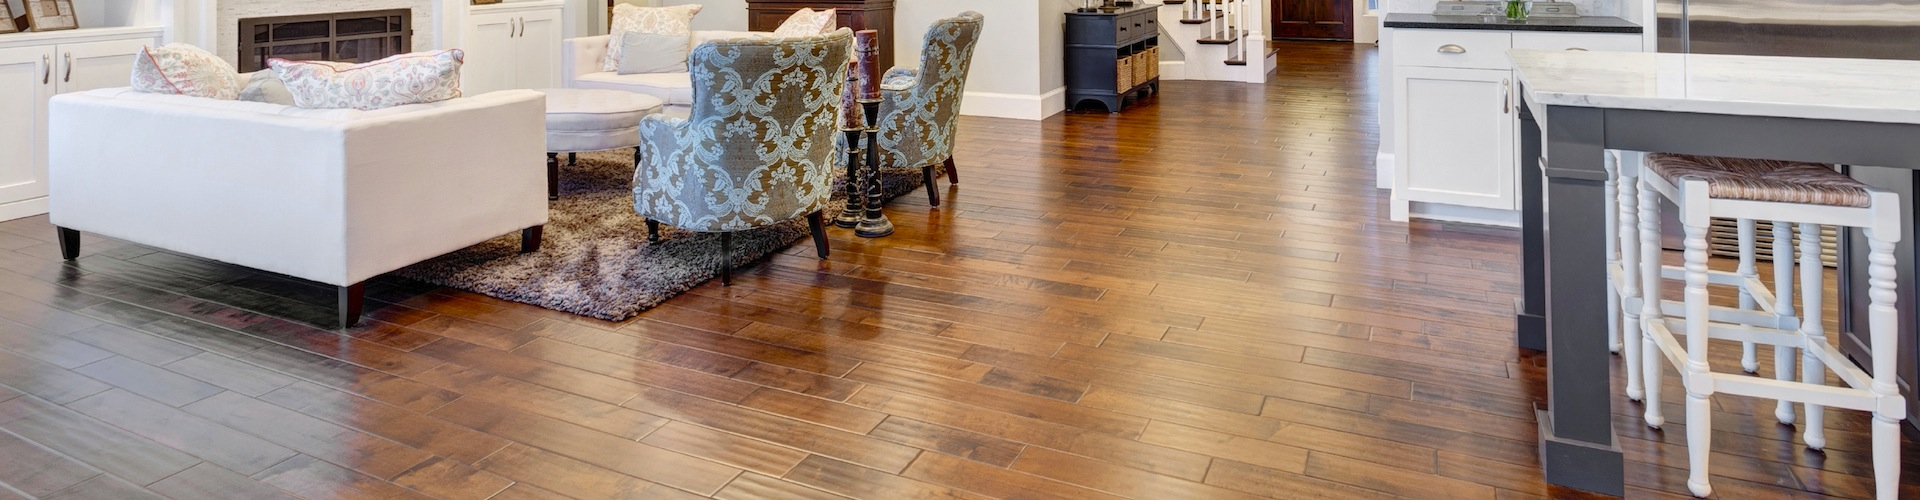 Northbrook flooring specialist duncan hardwood flooring living room in luxury home doublecrazyfo Image collections